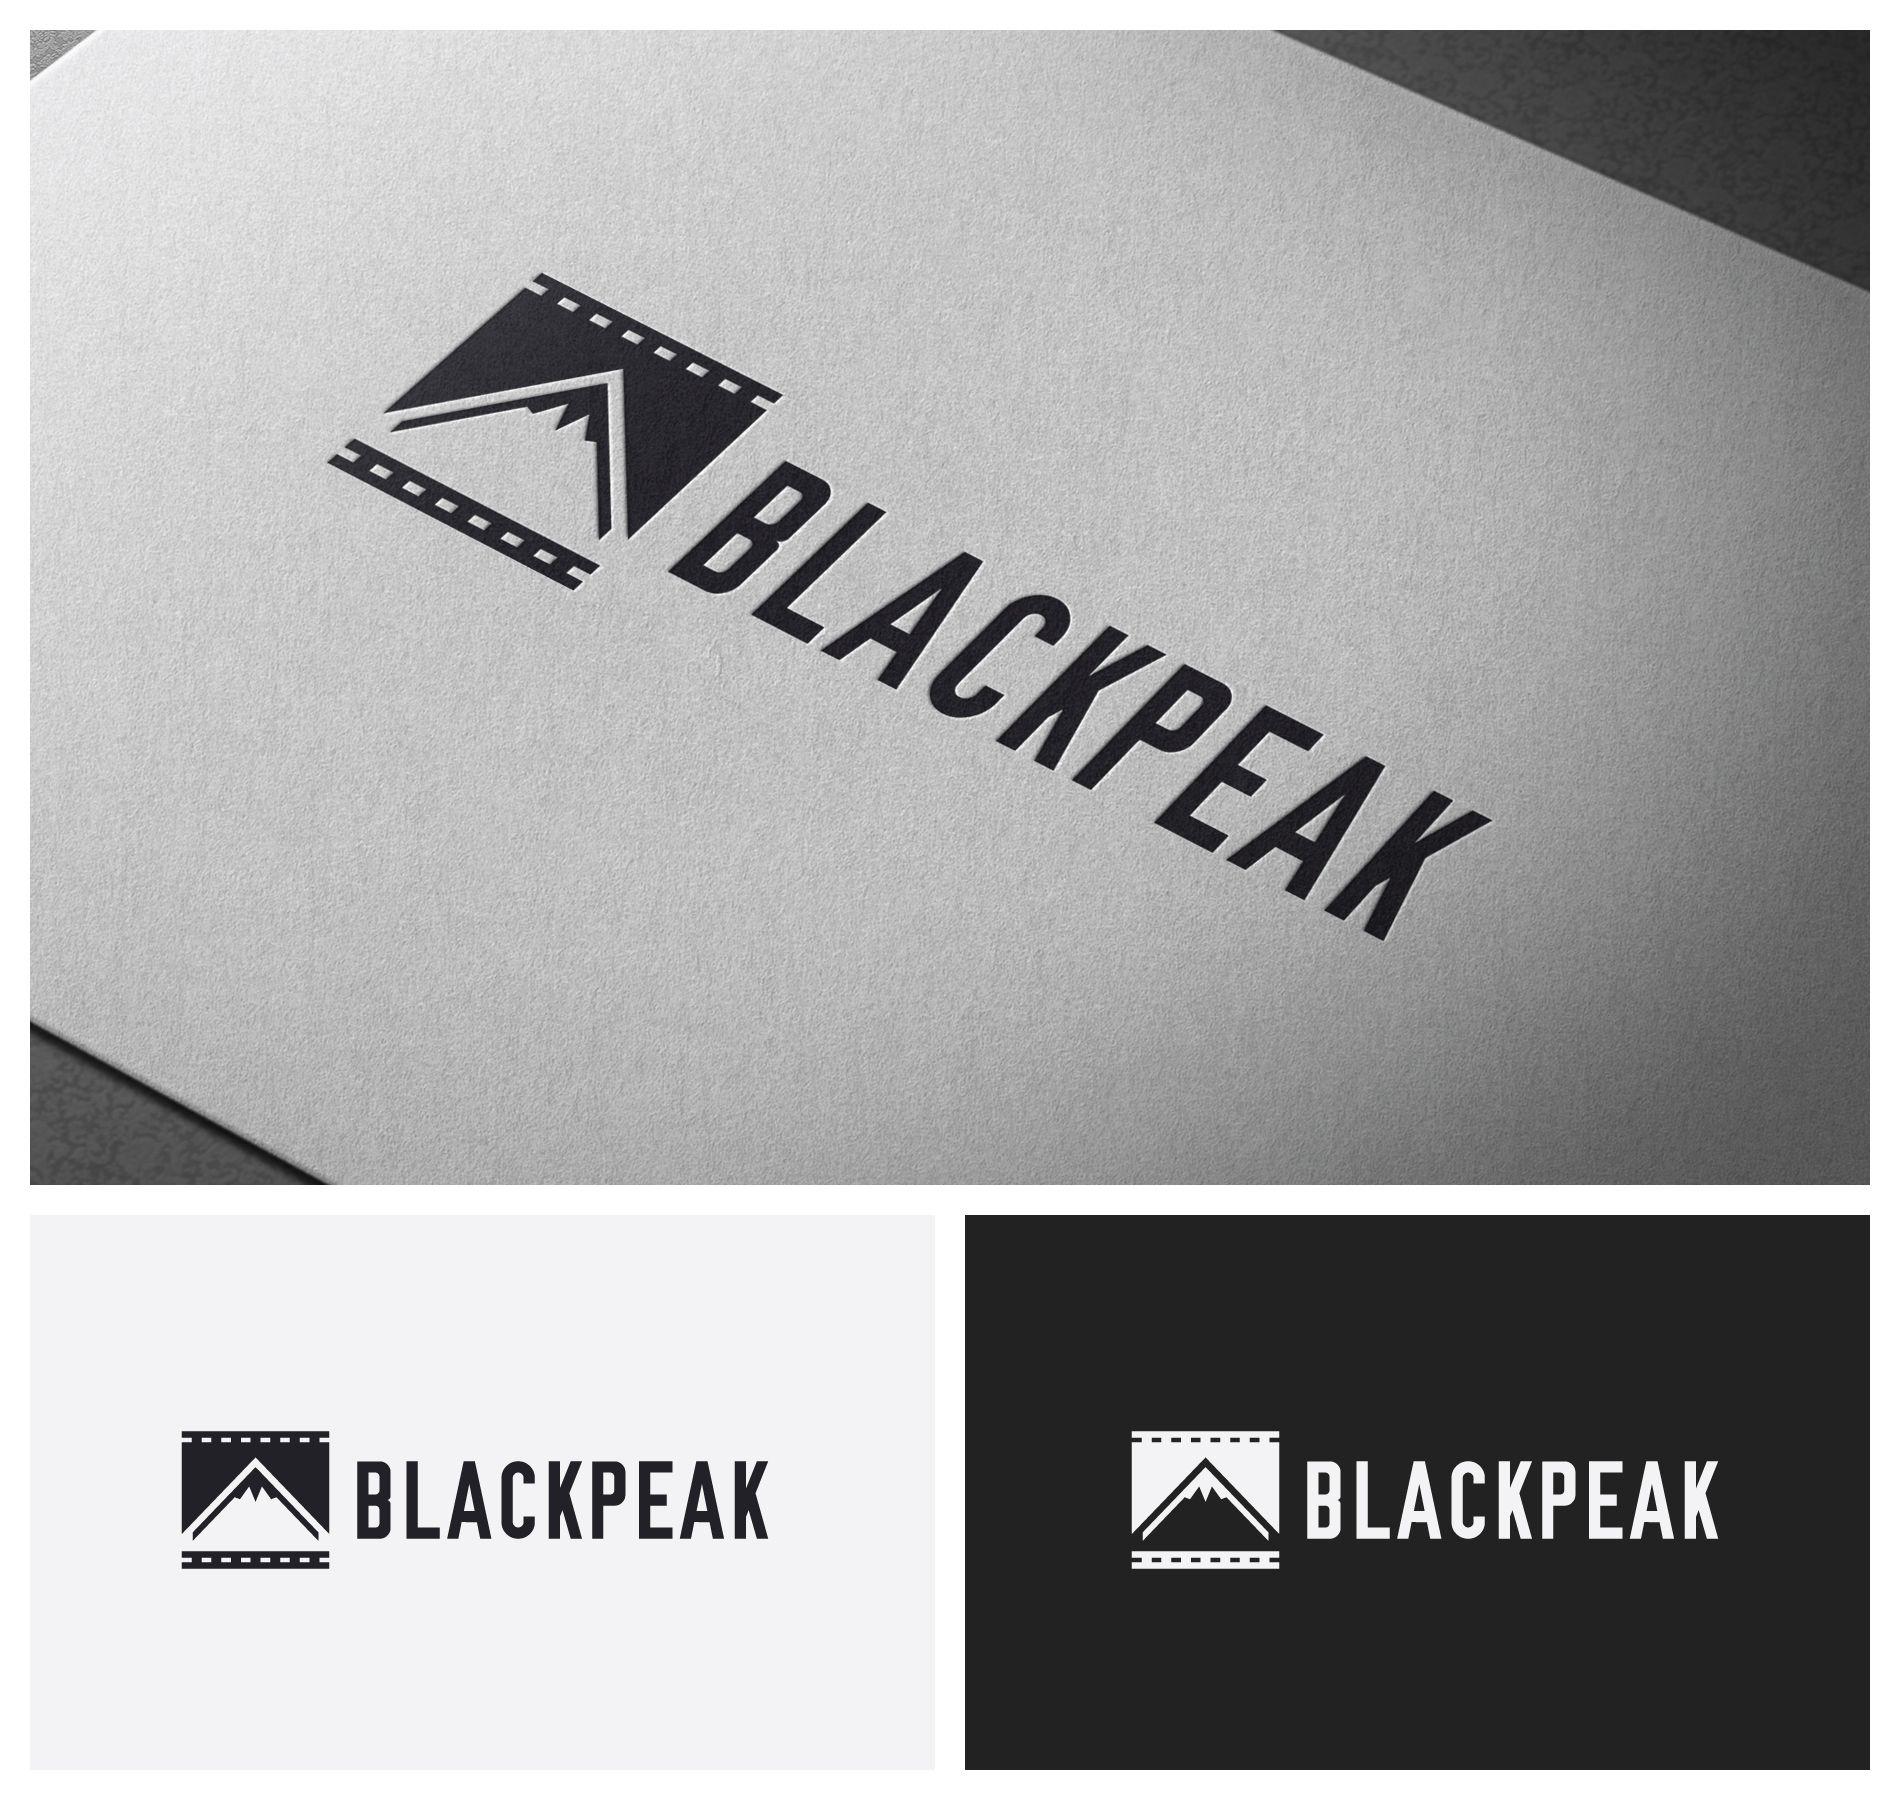 clever urban logo for a new digital film company black